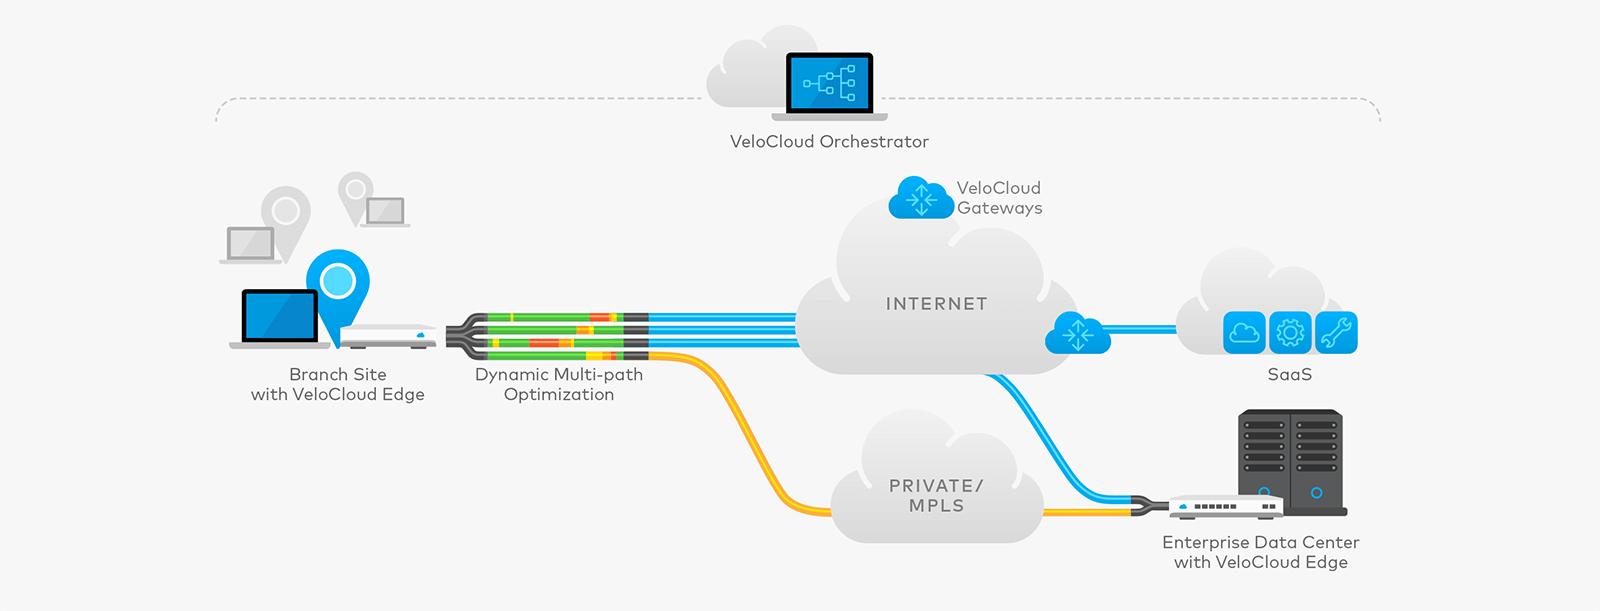 VMware، بهترین گزینه جهت پیادهسازی WAN Edge Infrastructure